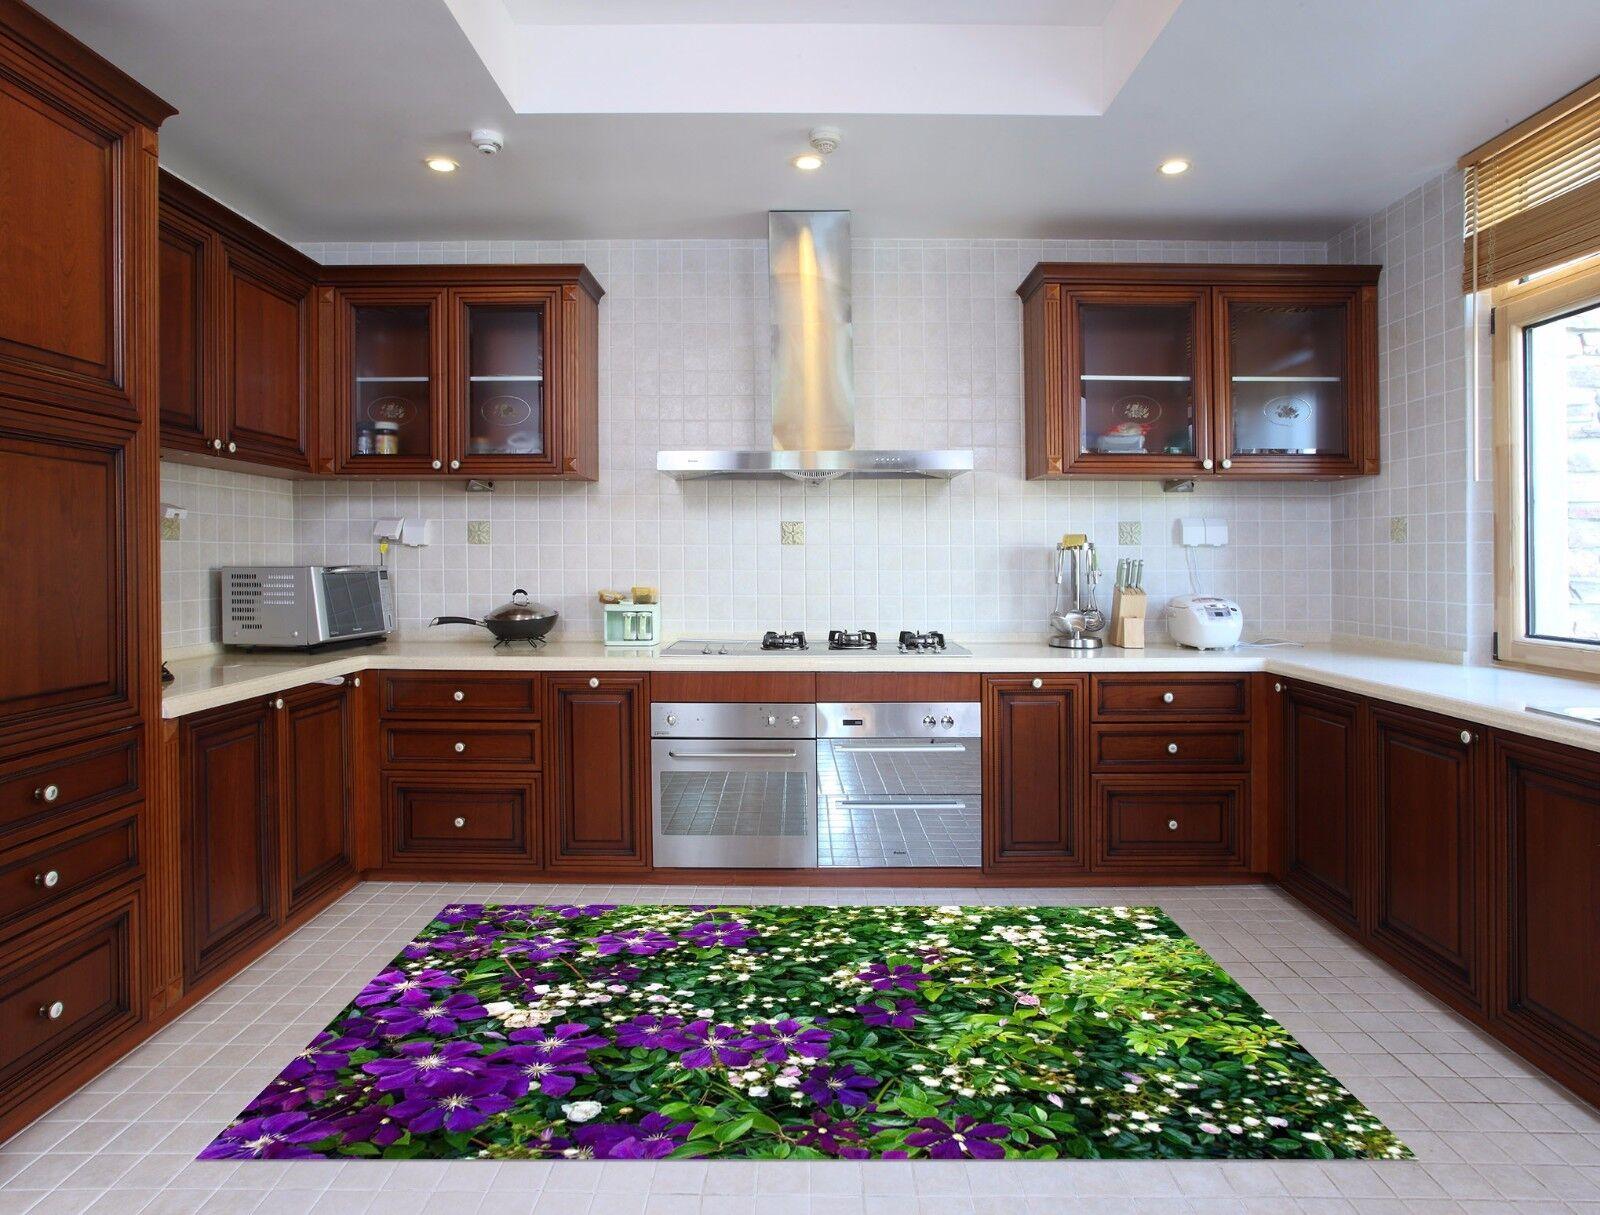 3D Leaves Flowers2 Kitchen Mat Floor Murals Wall Print Wall AJ WALLPAPER UK Kyra